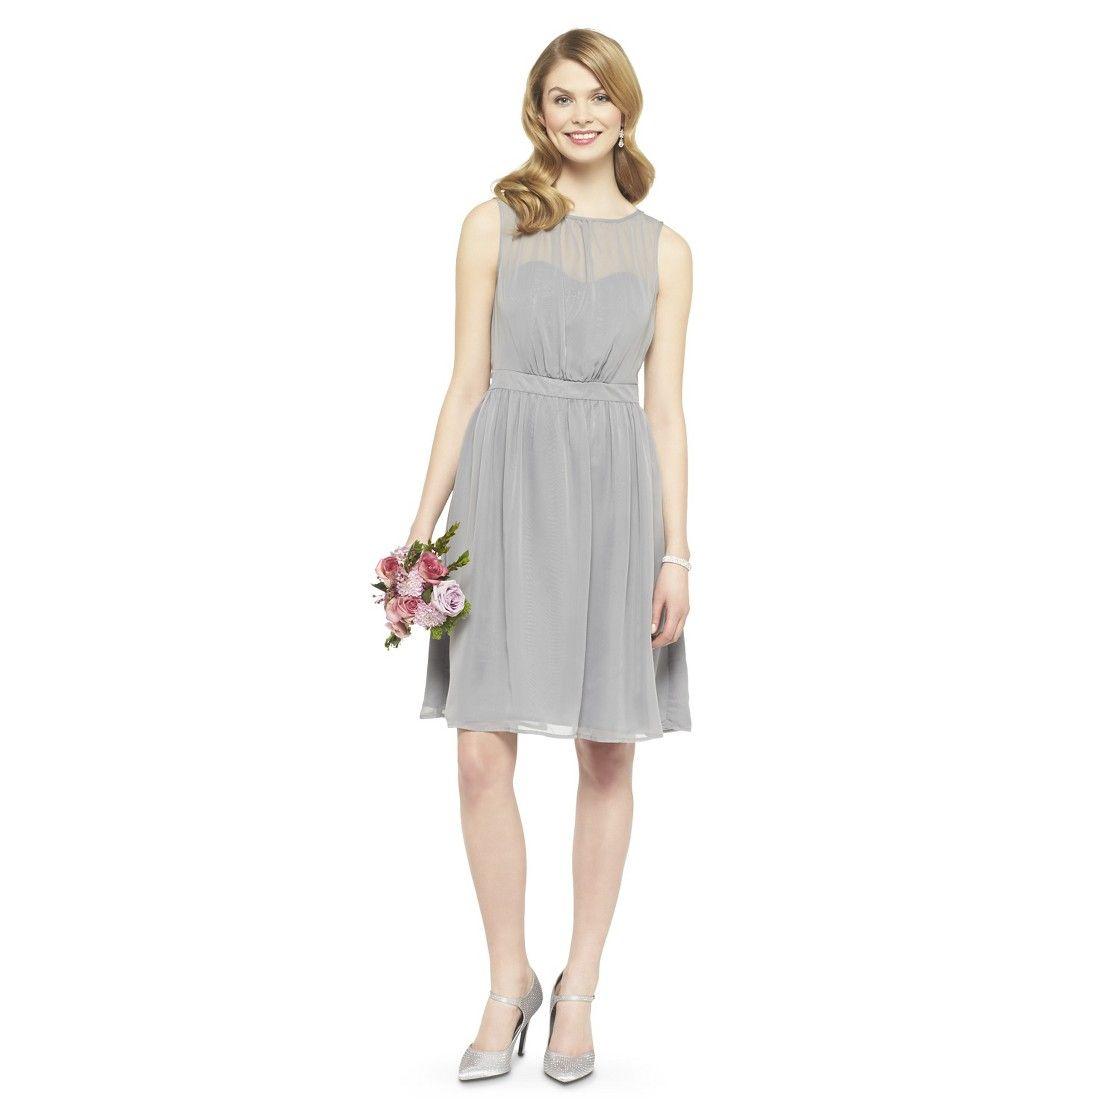 Womenus chiffon illusion sleeveless bridesmaid dress neutral colors